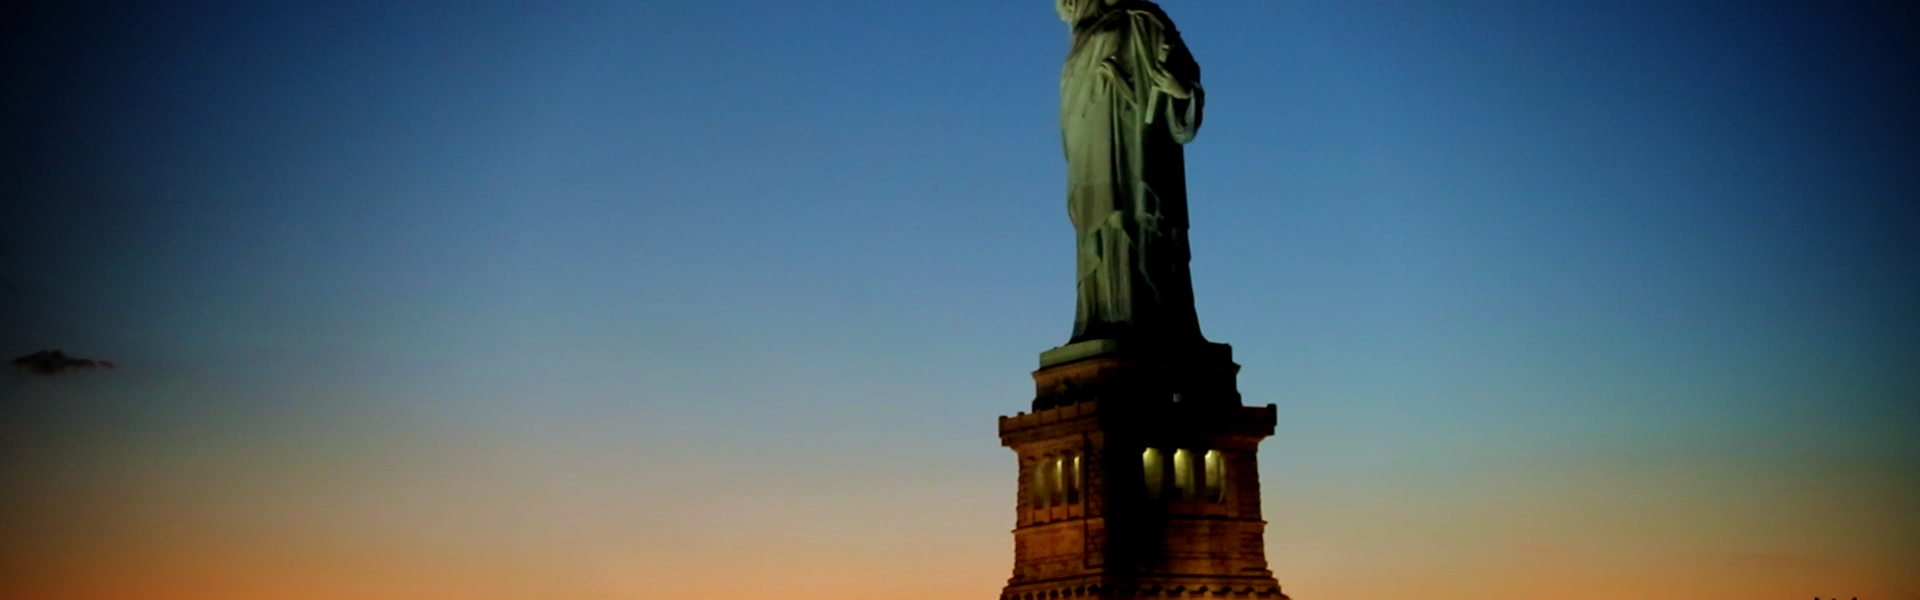 StatueofLiberty_NYC_Screengrab_ICONIC_01